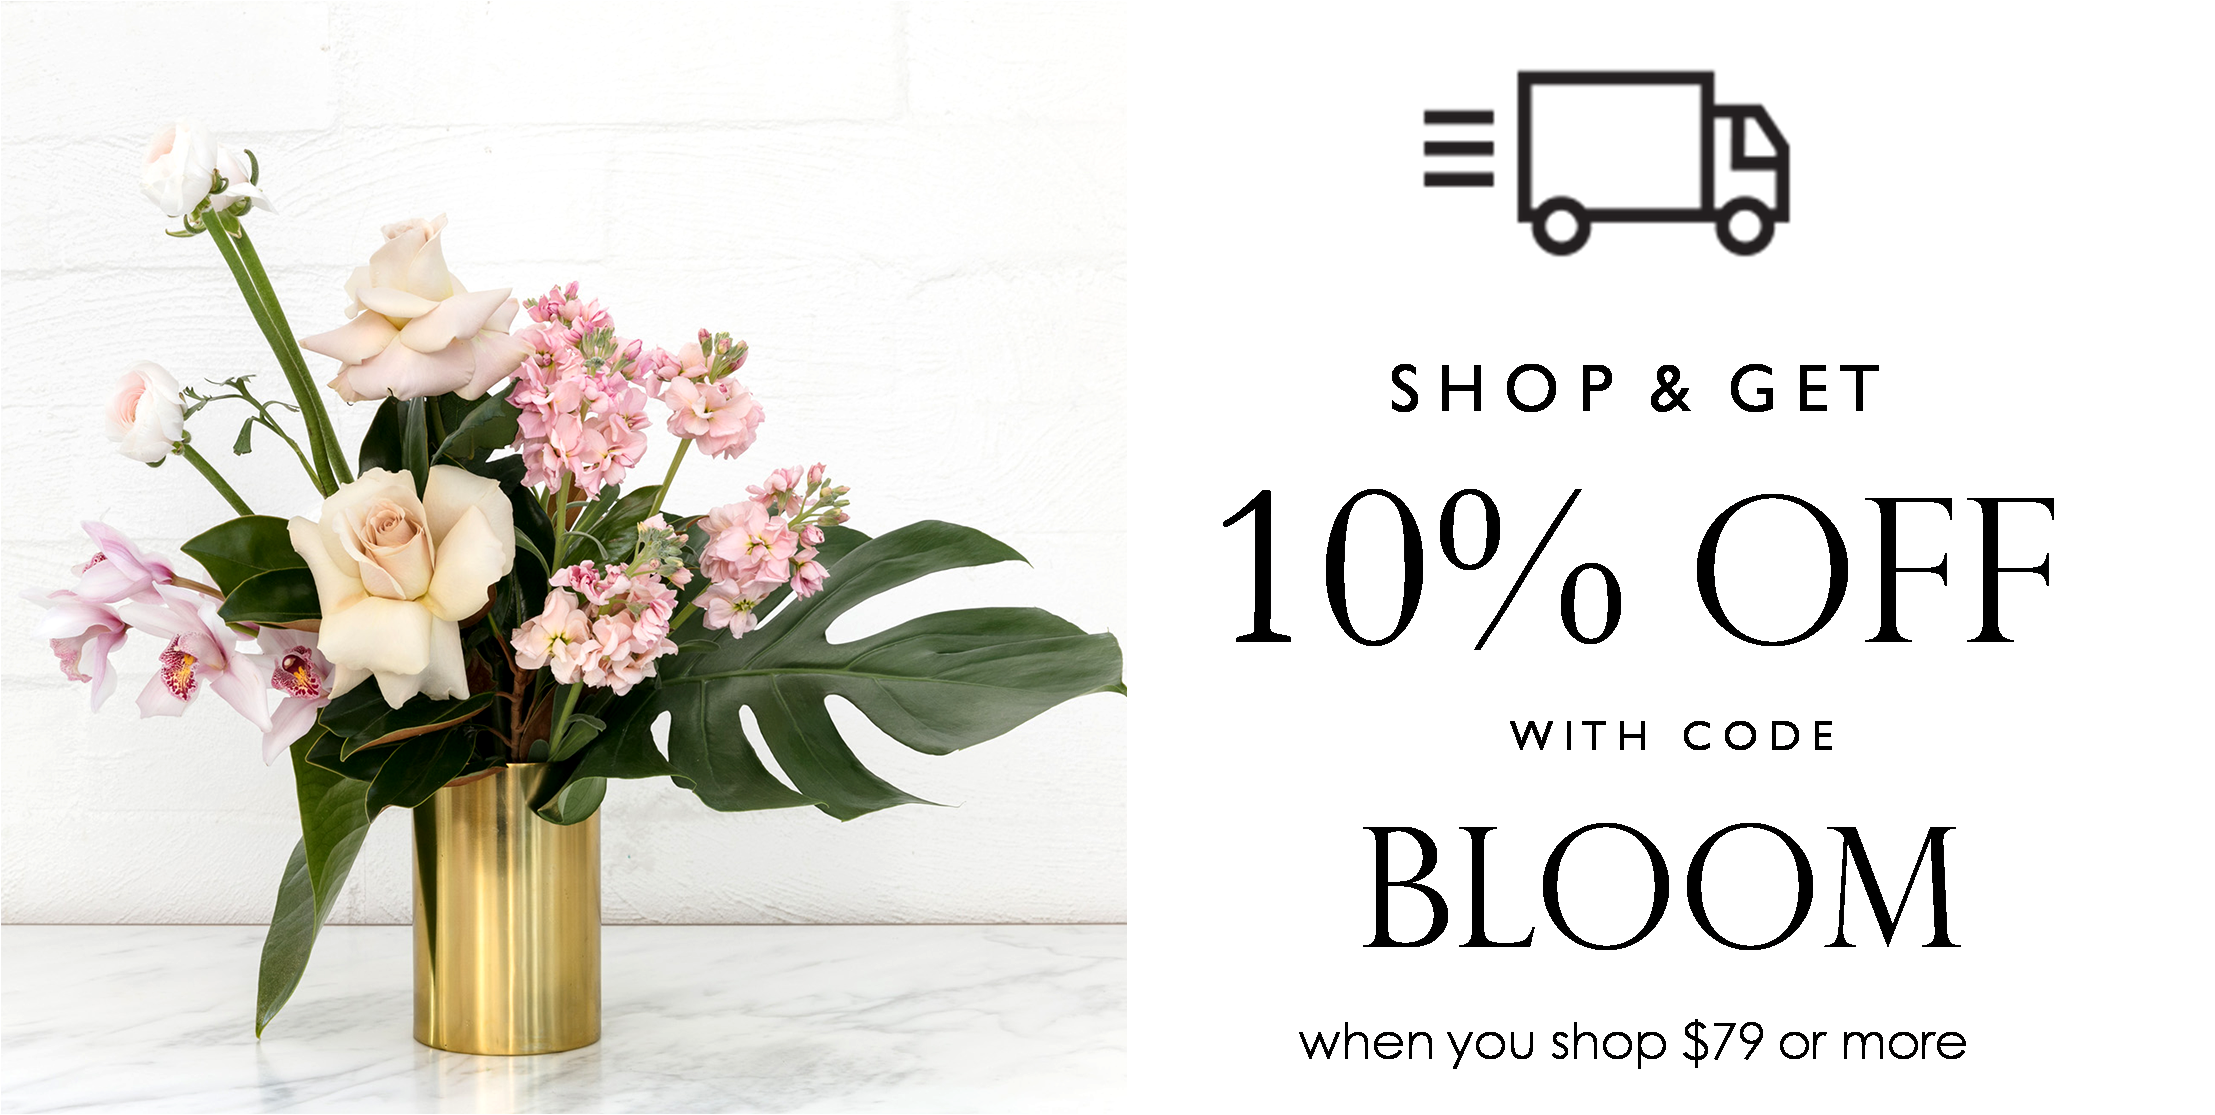 79912-we-make-el-paso-bloom-with-luxury-gifts-rose-boxes-angies-floral-designs-angies-we-make-el-paso-el-paso-florist-birthday-bloom-floral-instagram-same-day-delivery-designs-rose-delivery-el-paso-florist-angies-flower.png